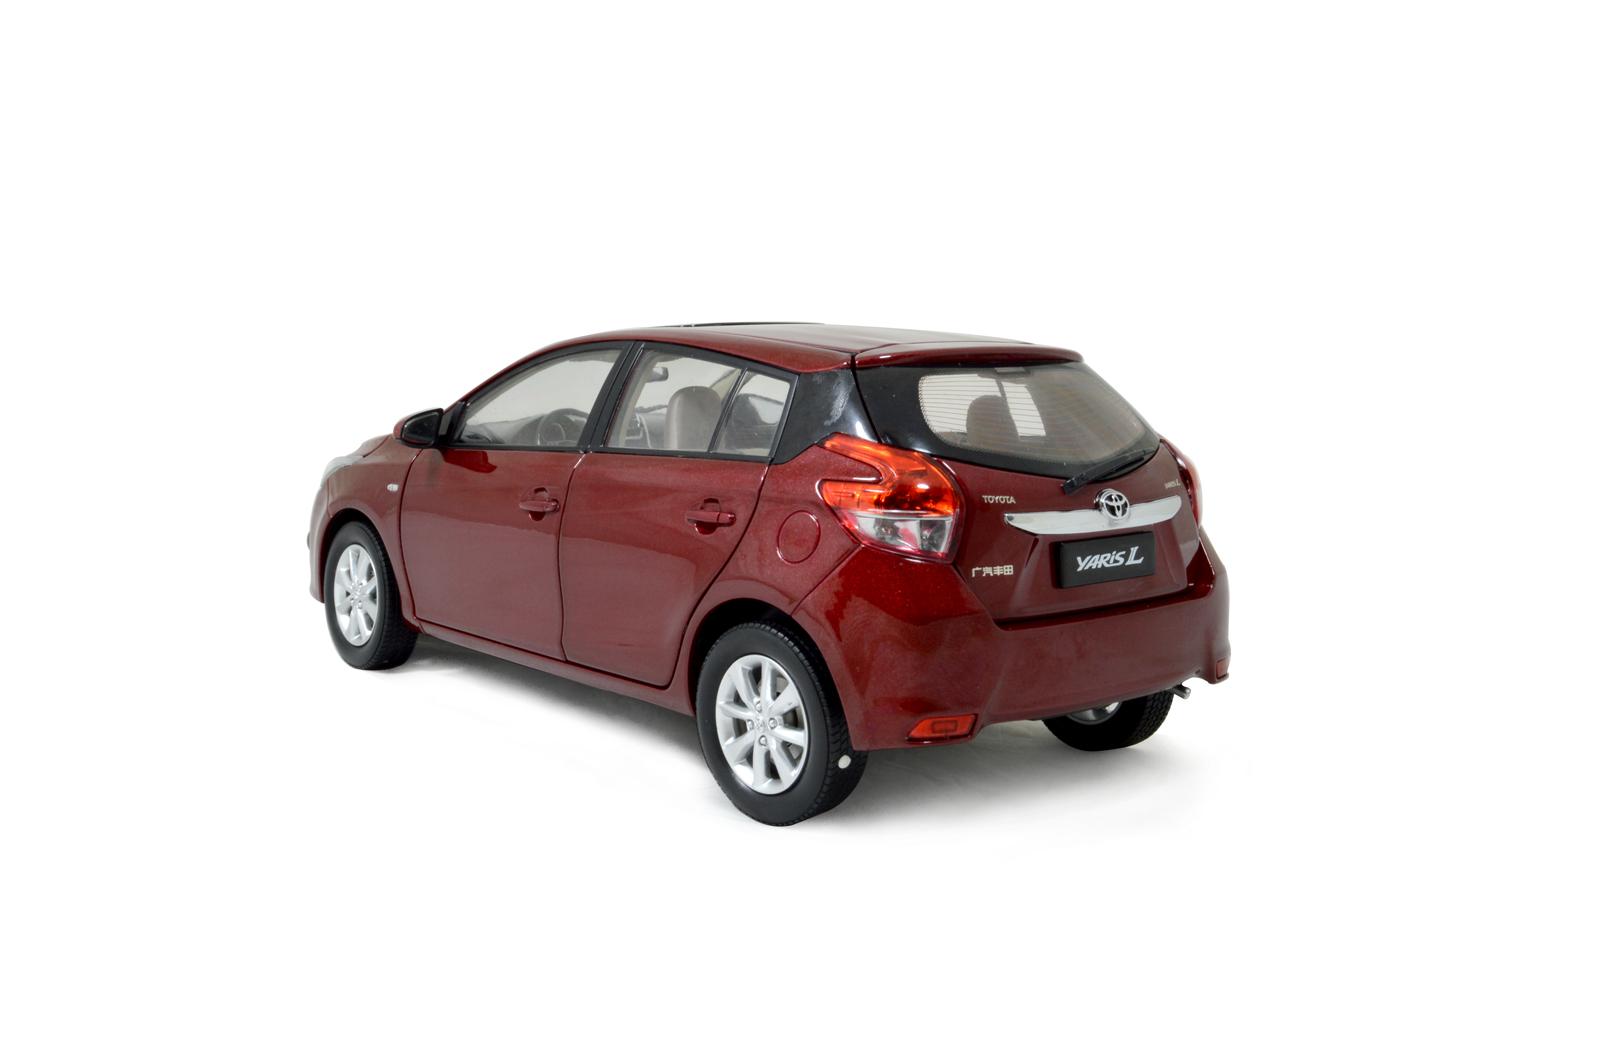 Toyota Yaris L 2014 1 18 Scale Diecast Model Car Wholesale